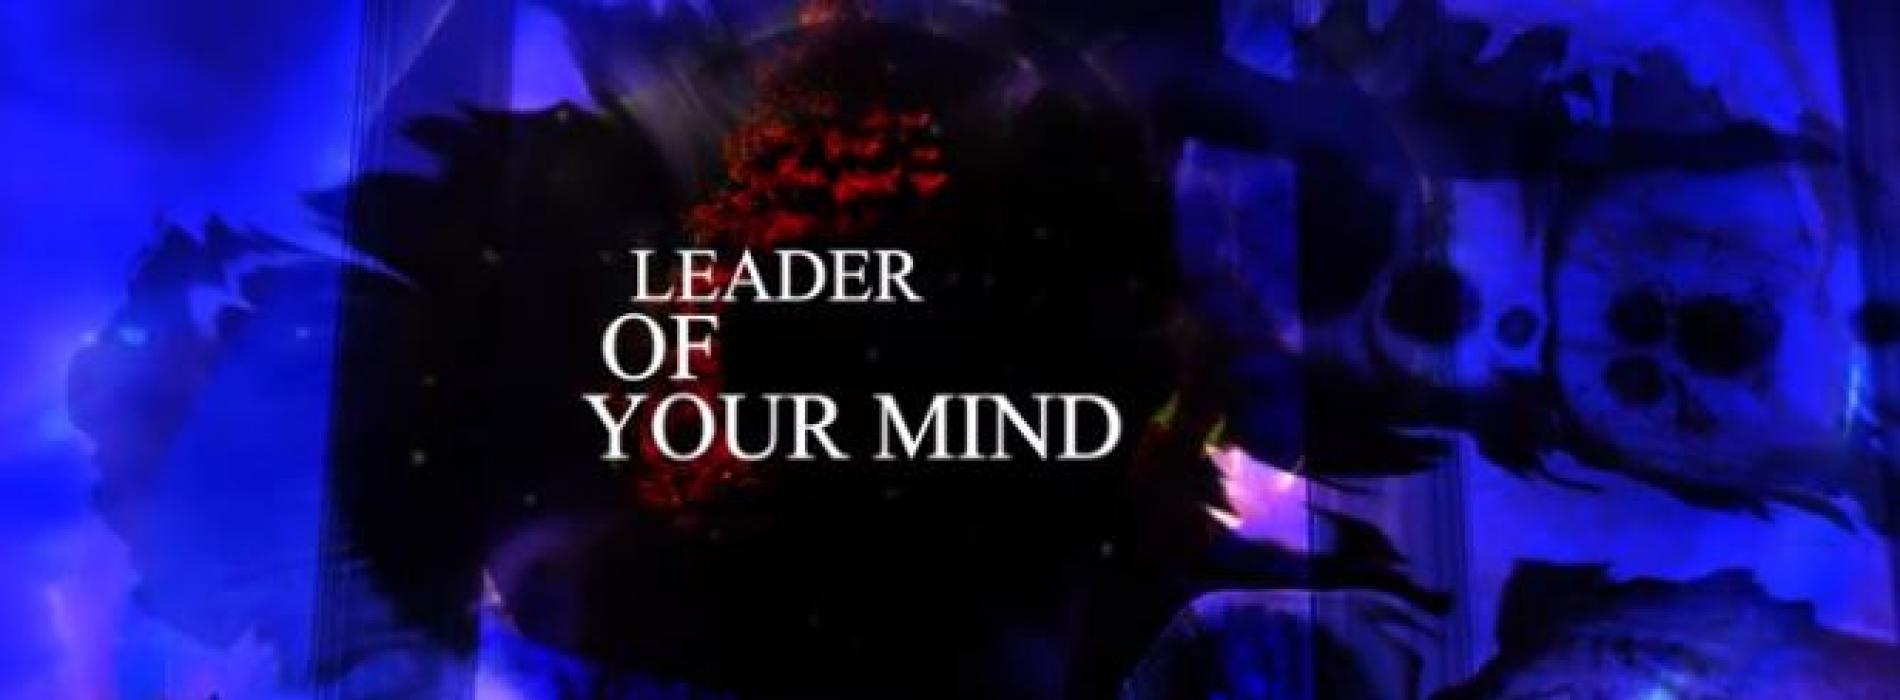 New Music : Leader Of Your Mind – Tenny, Natalya and Aitana